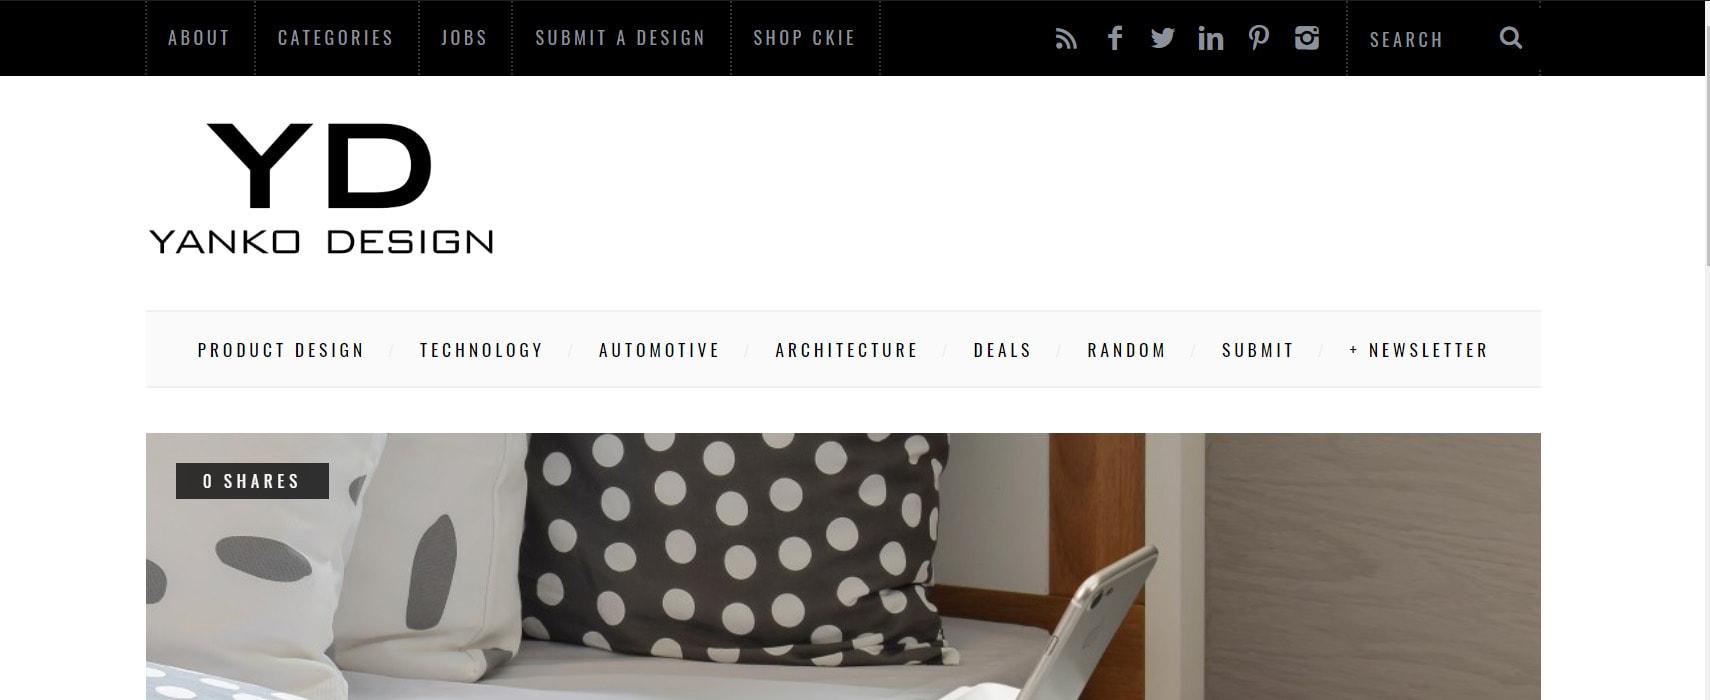 Yanko Design Blog